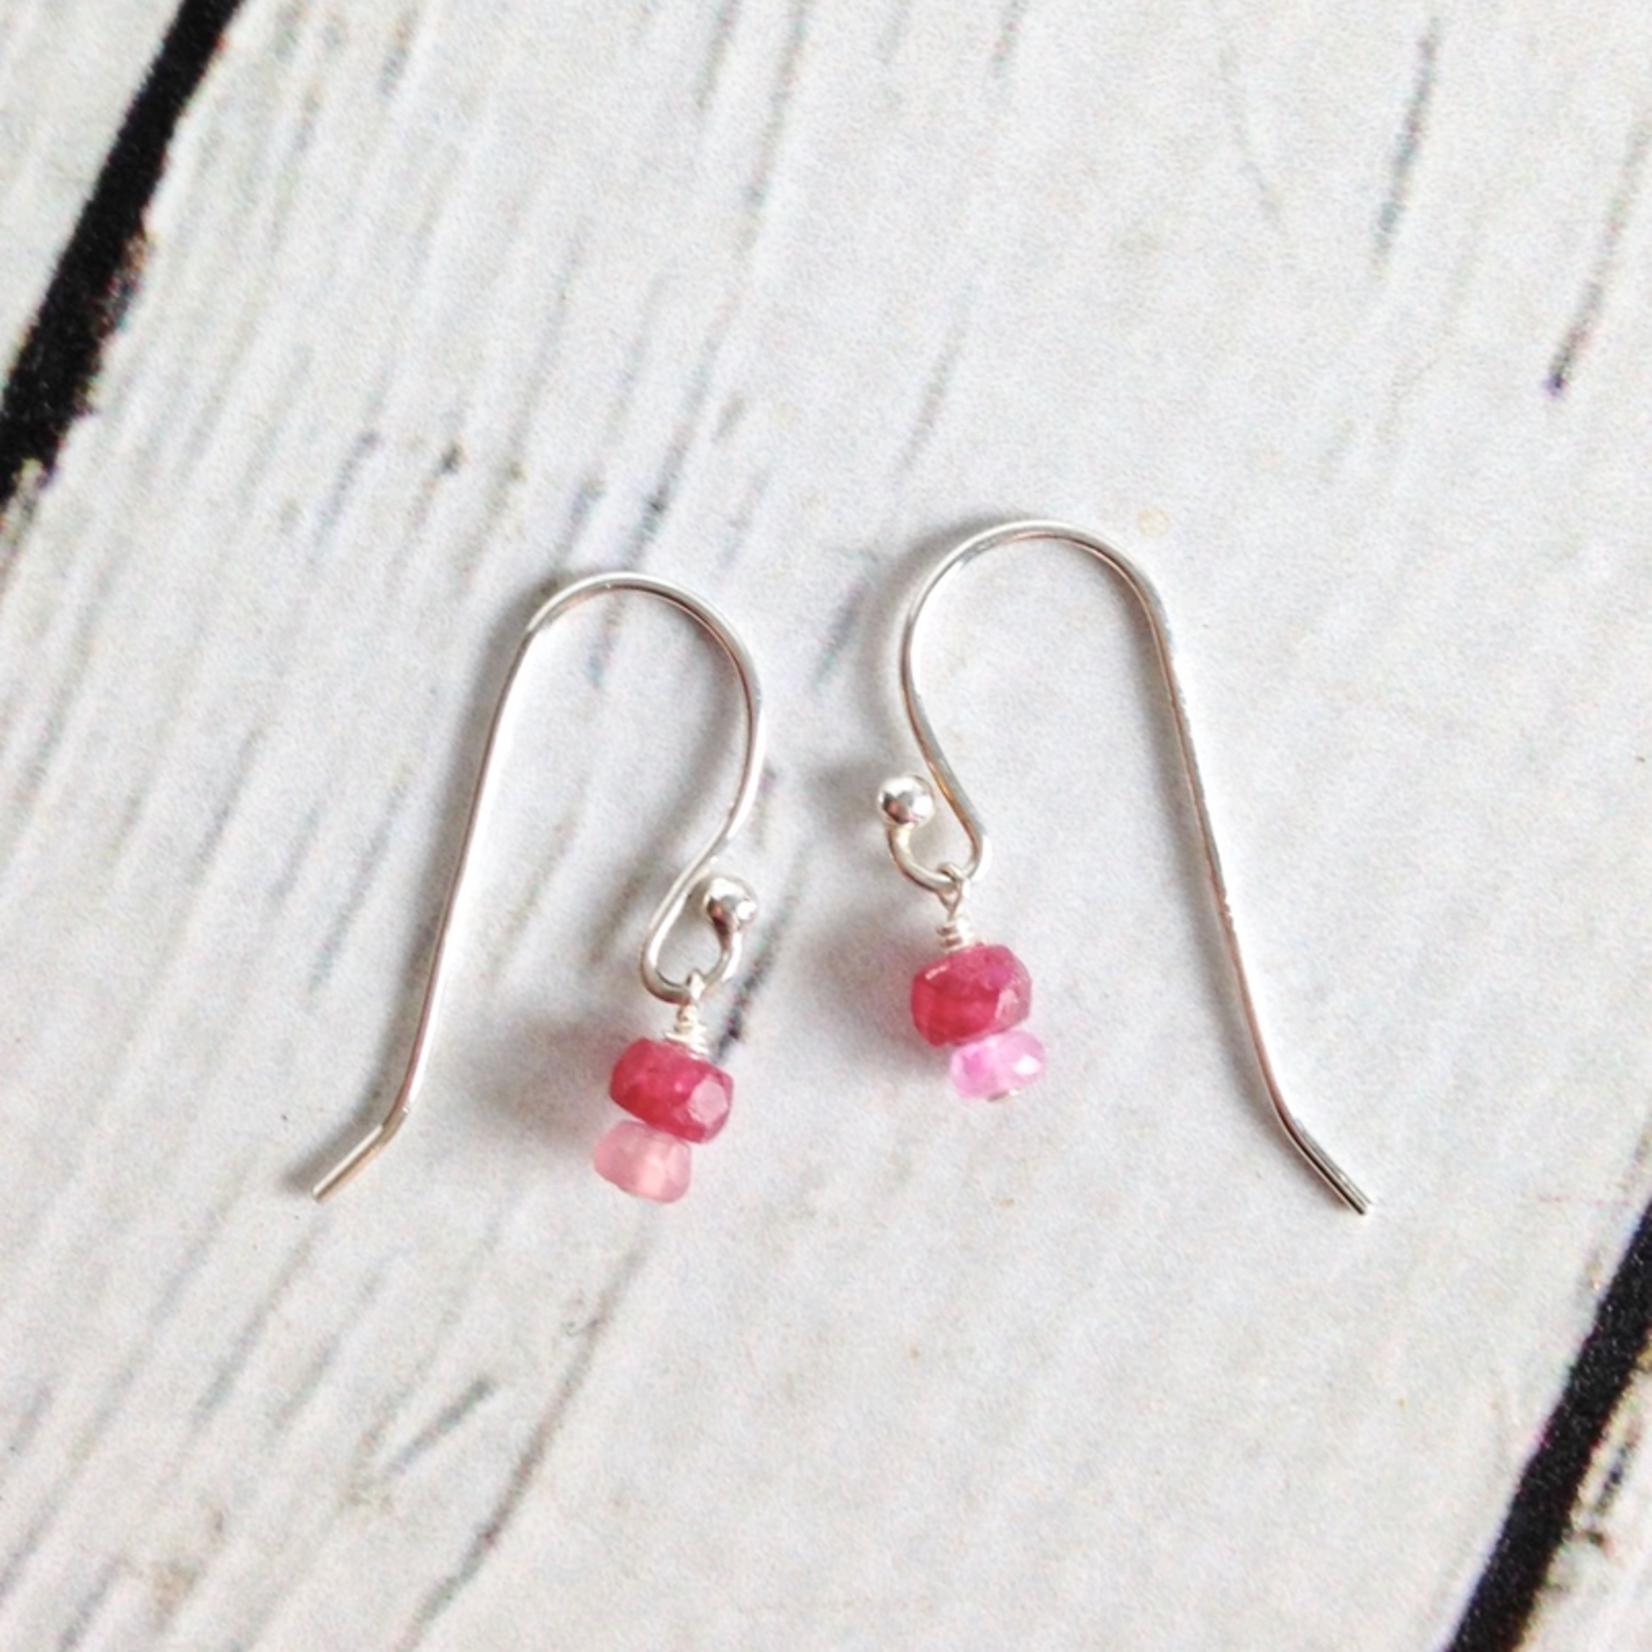 Handmade Tiny Stack Birthstone Earrings